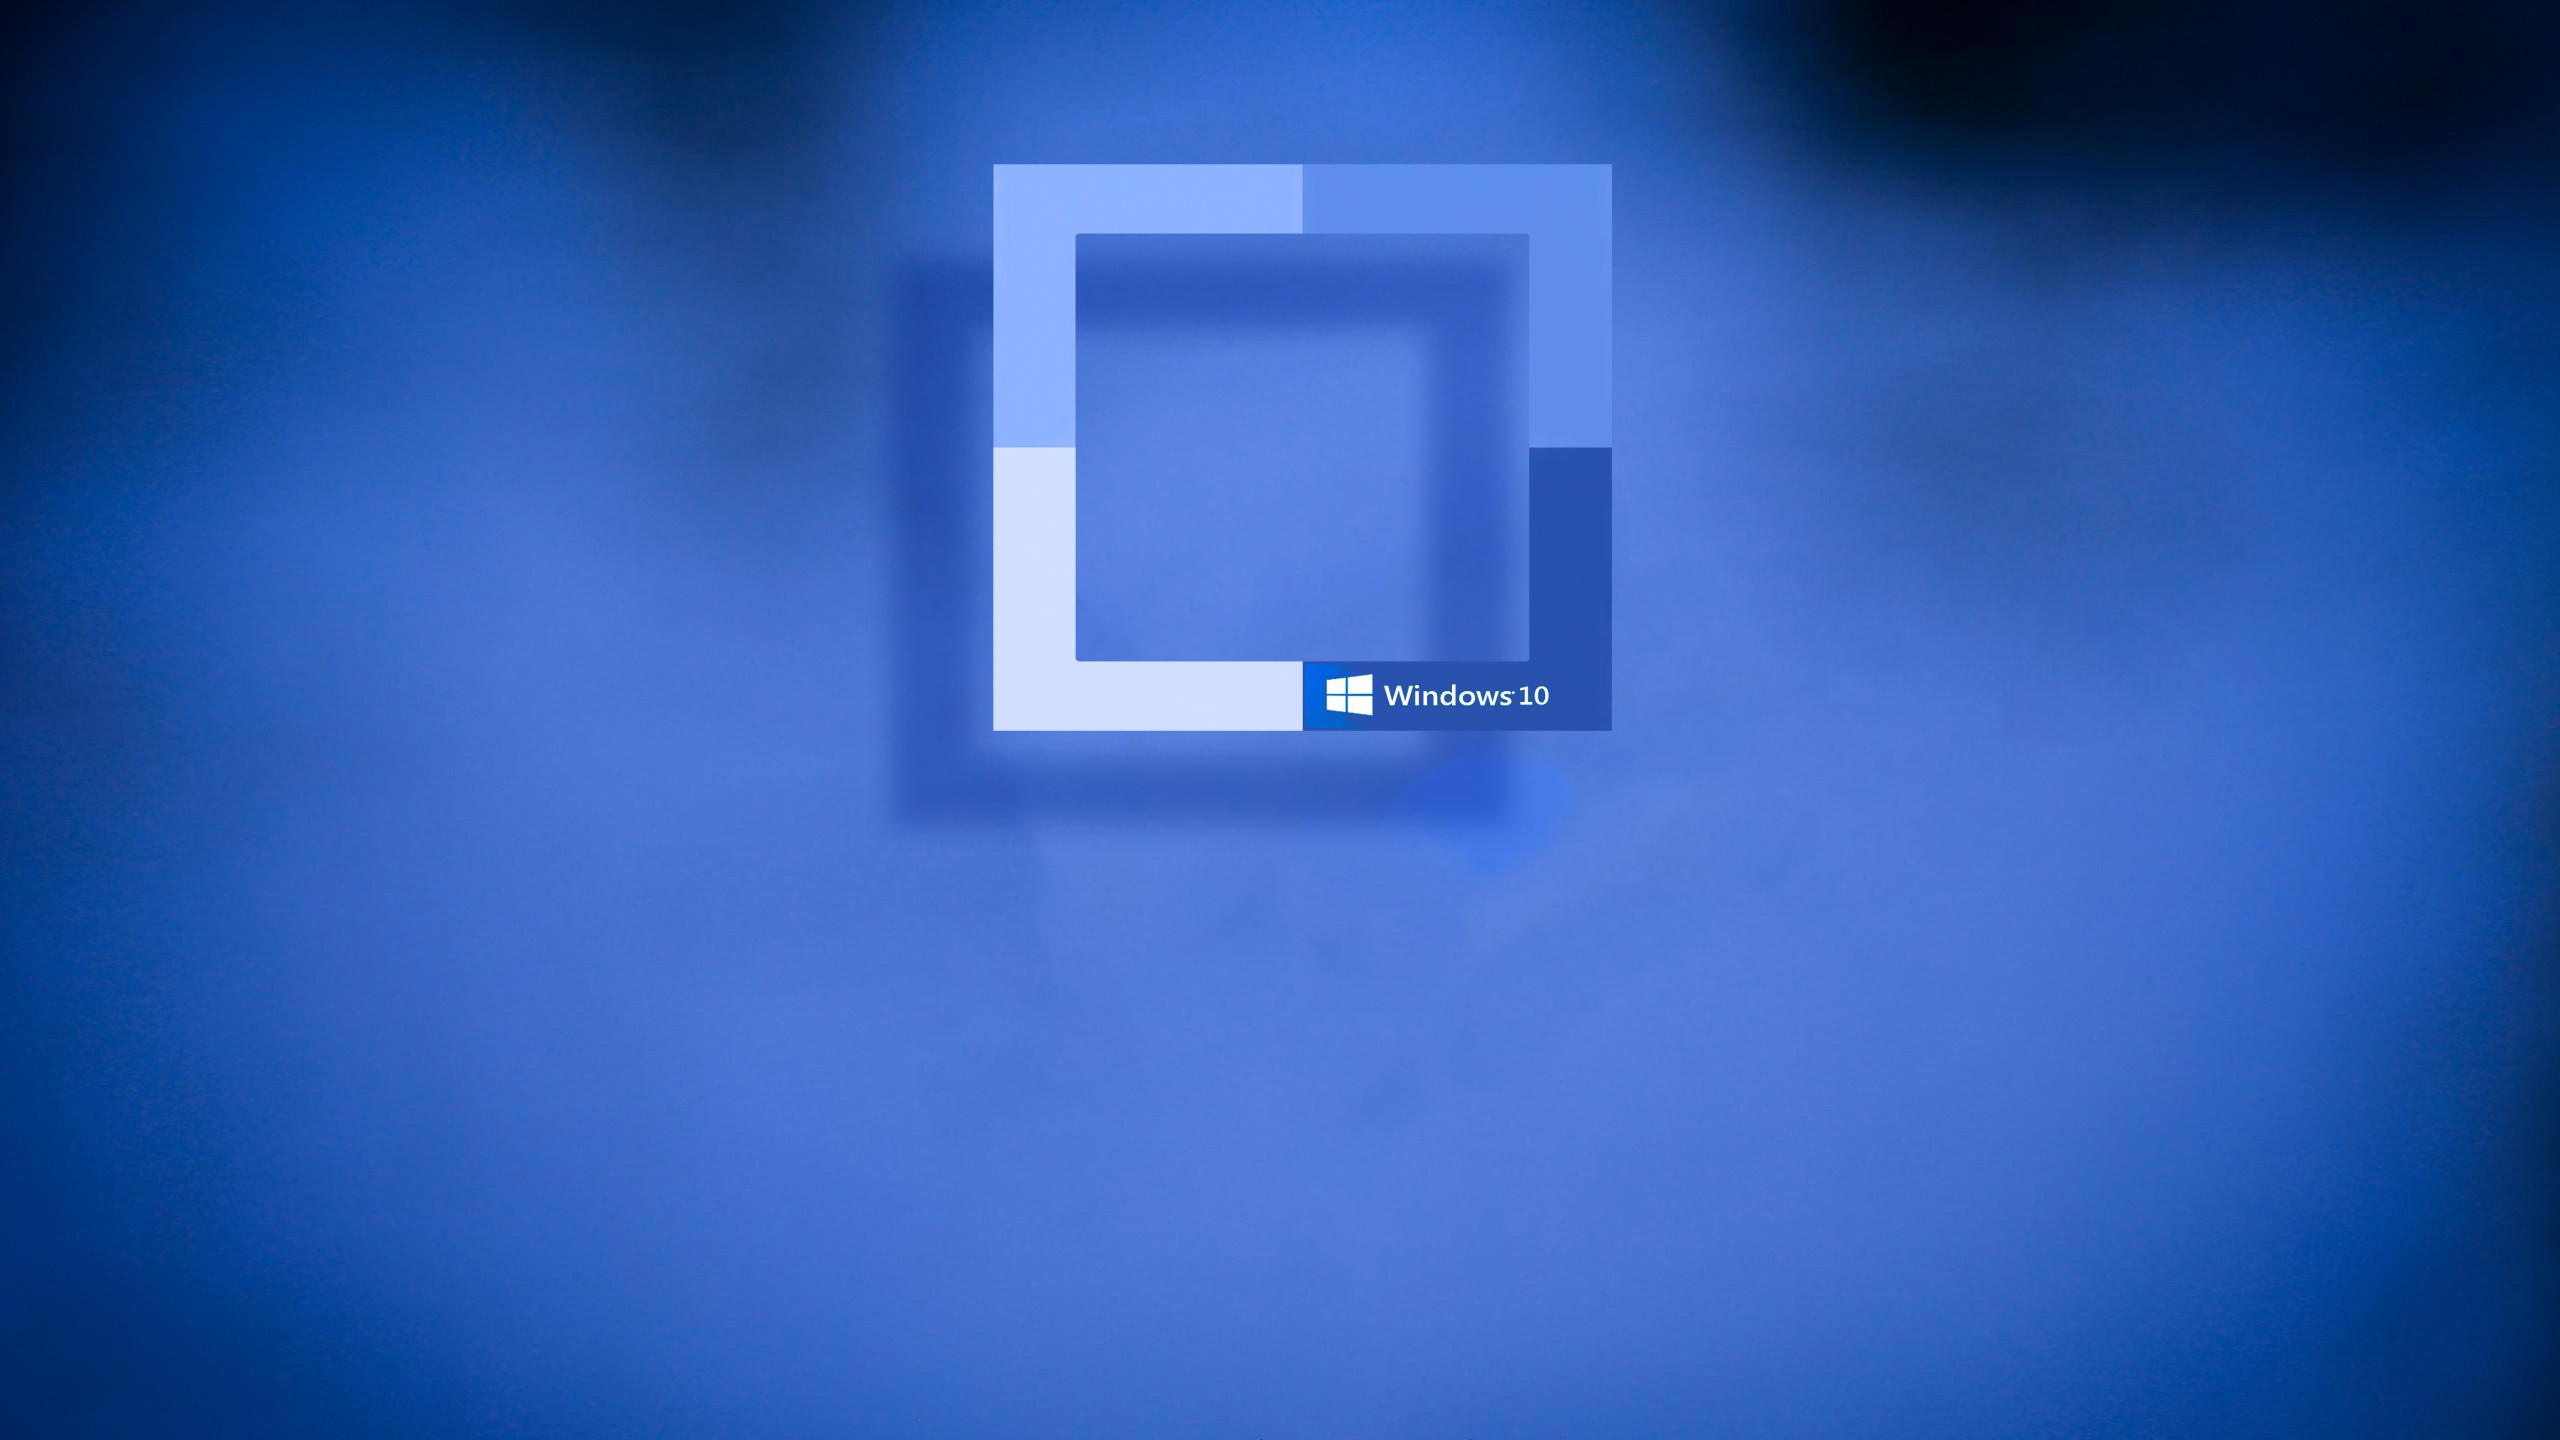 Hd wallpaper windows 10 - Windows 10 Wallpapers Desktop Backgrounds 5 Windows10 Wallpaper